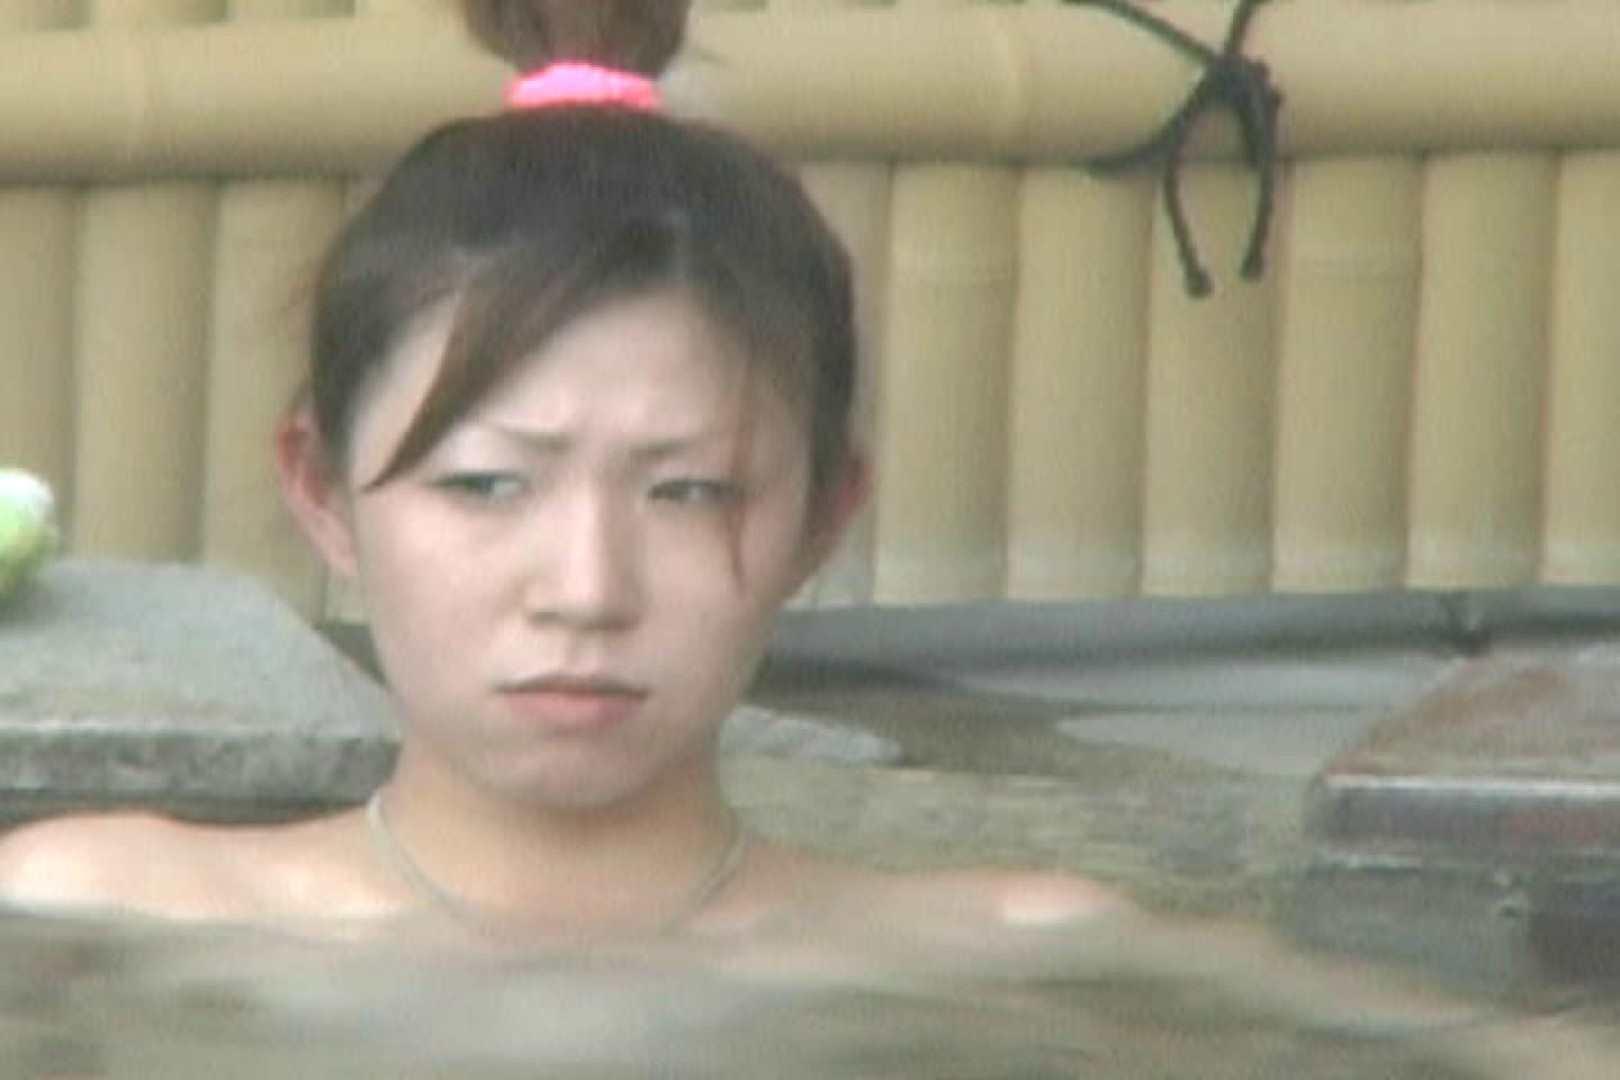 Aquaな露天風呂Vol.593 盗撮師作品 アダルト動画キャプチャ 83pic 11